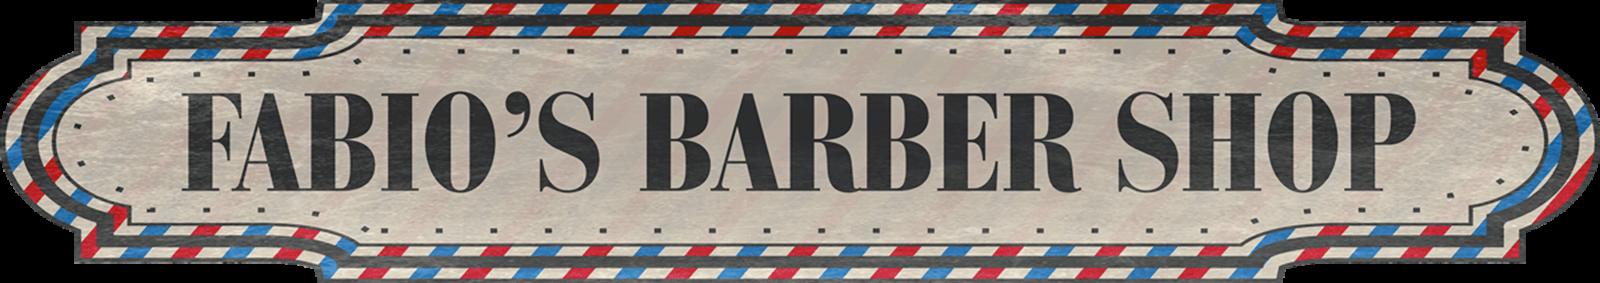 www.fabiosbarbershop.com